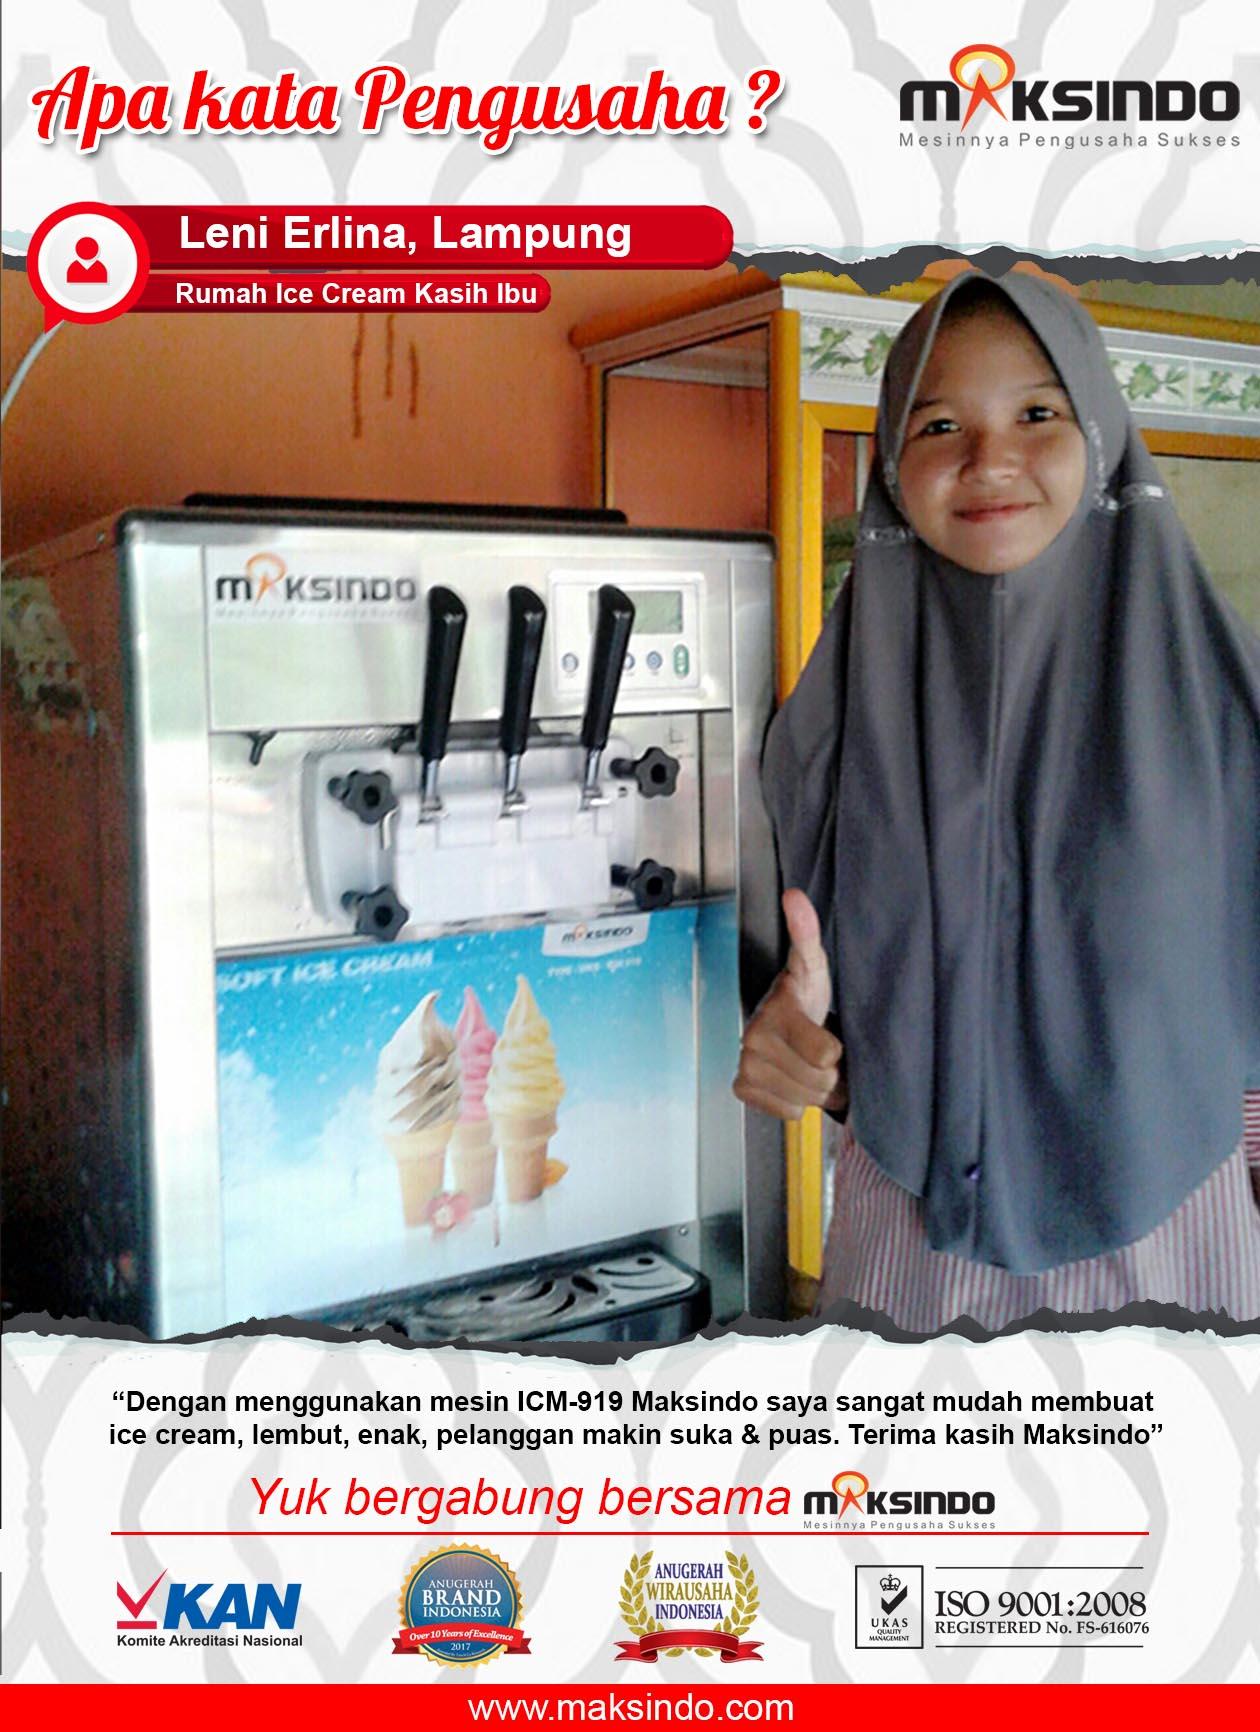 Rumah Ice Cream Kasih Ibu : Mesin ICM-919 Mudah Untuk Membuat Ice Cream